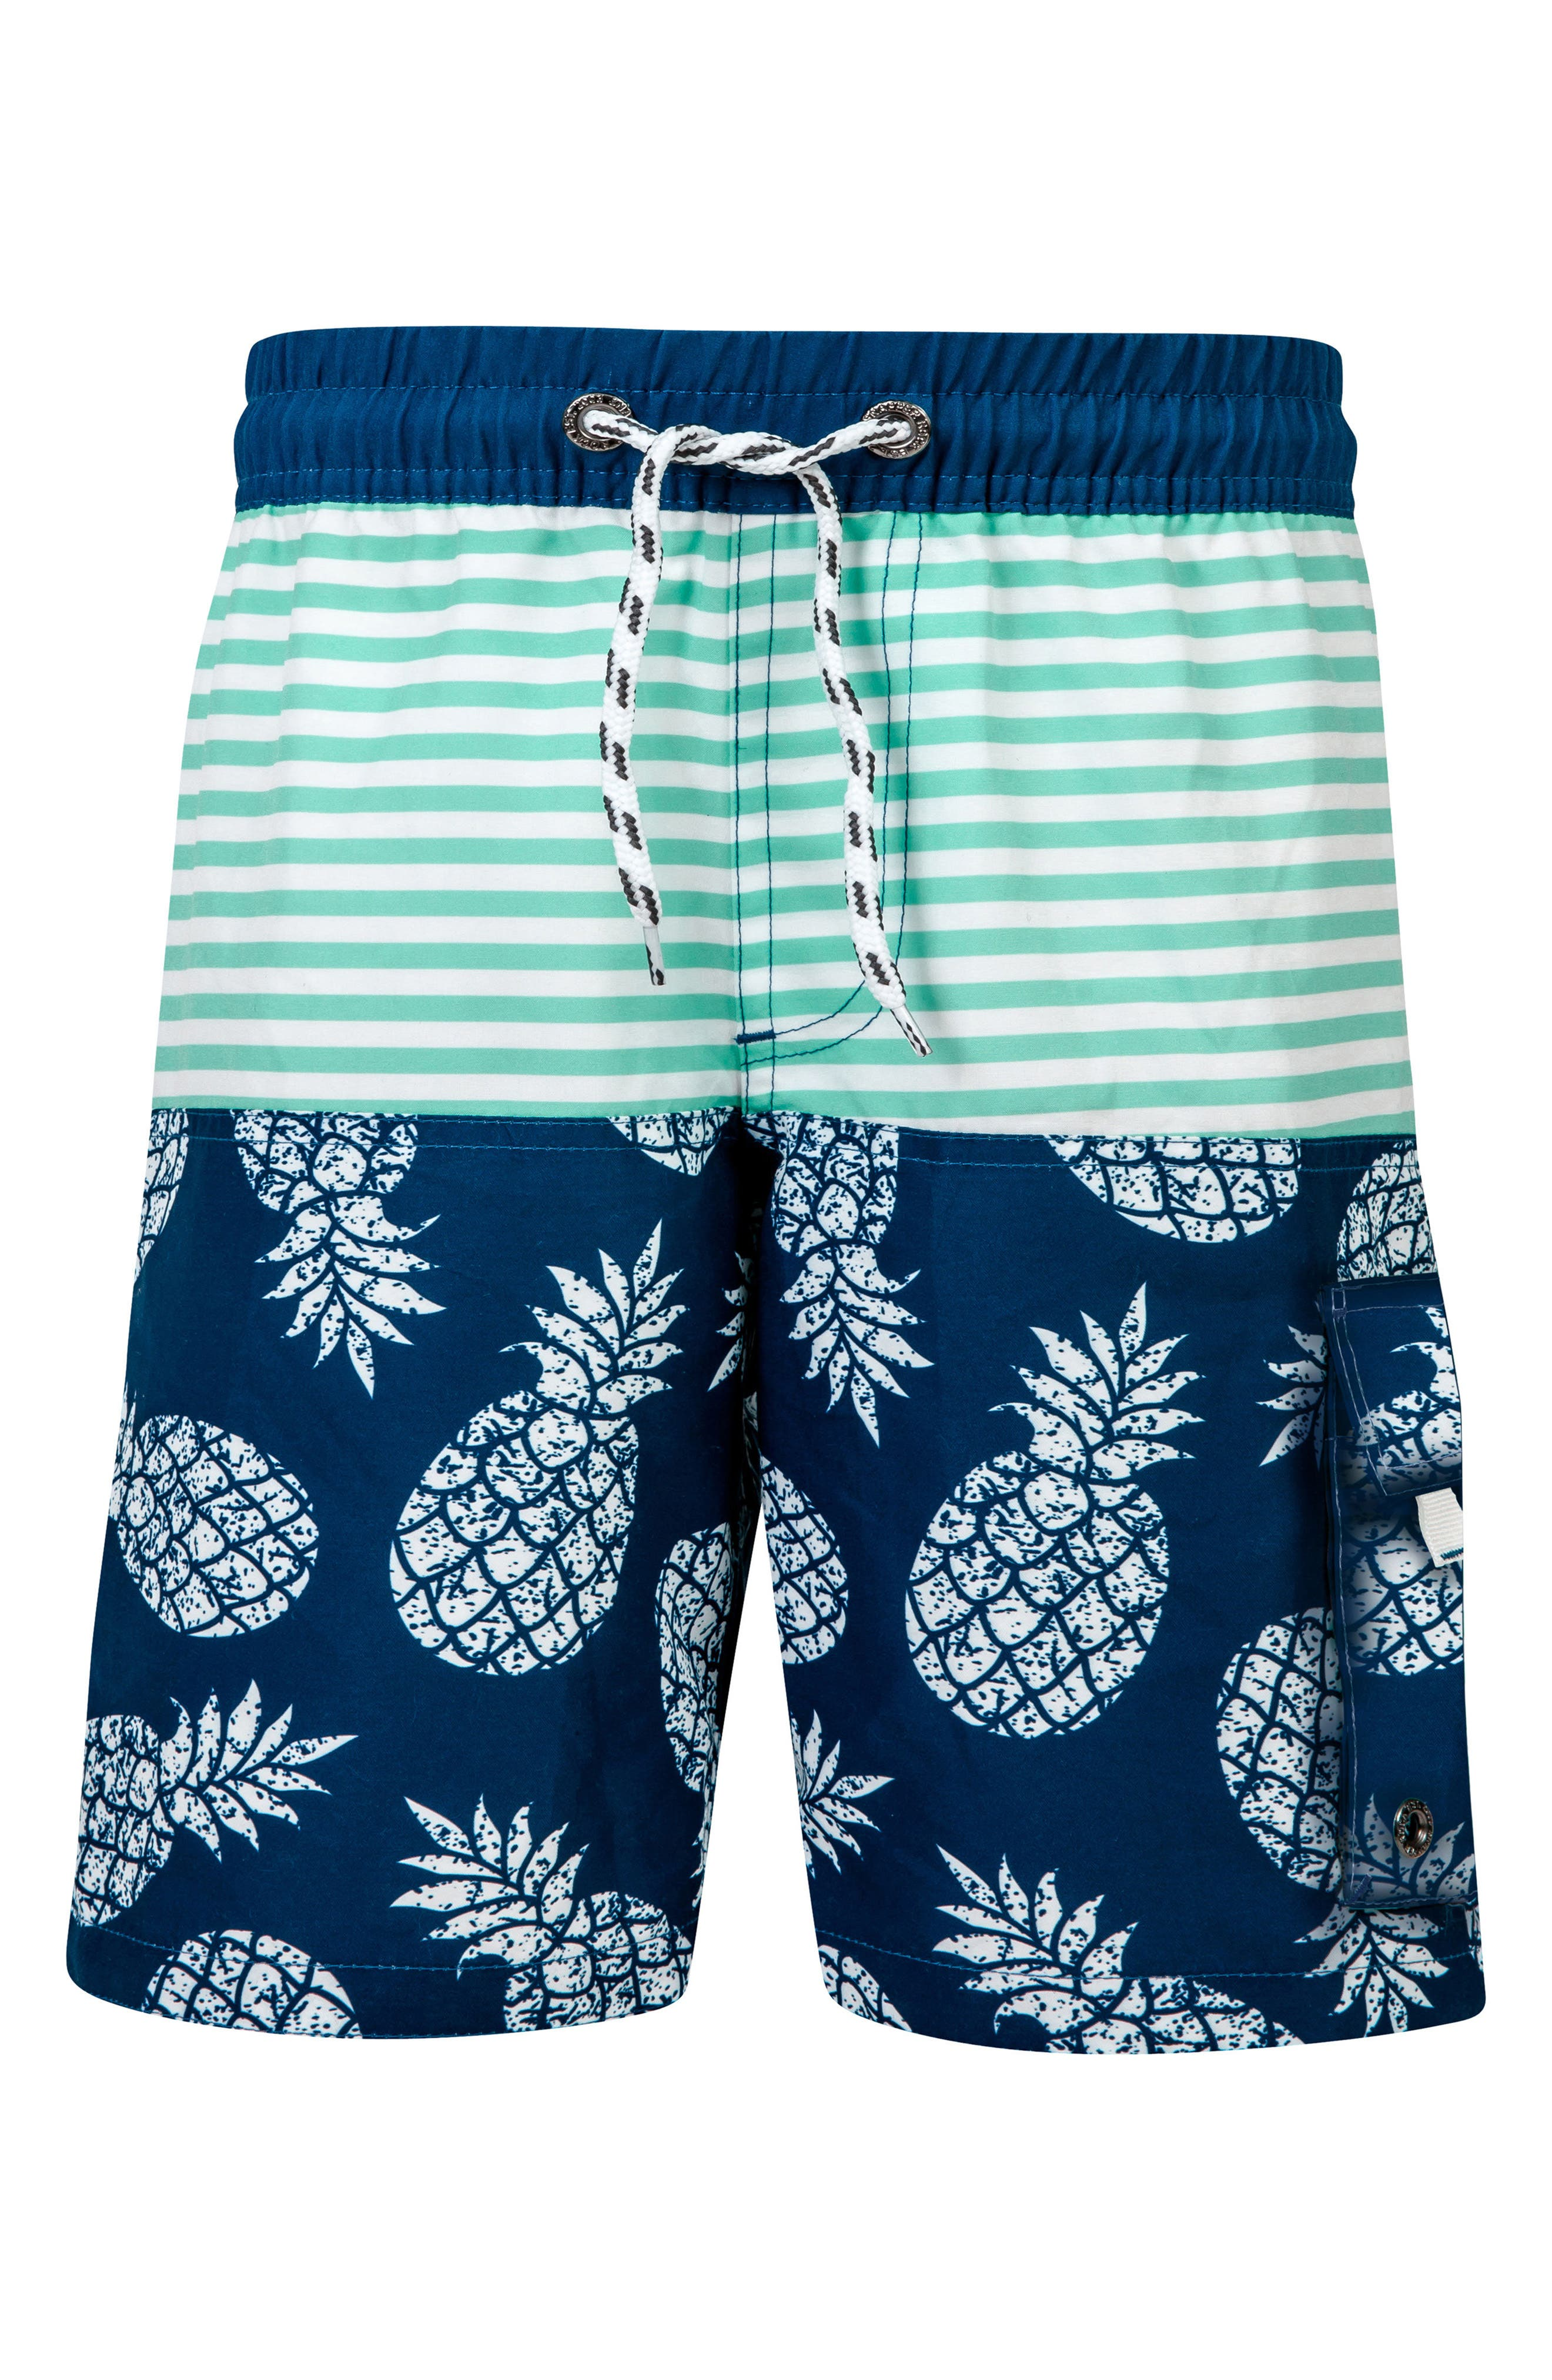 Main Image - Snapper Rock Pineapple Mint Stripe Board Shorts (Big Boys)